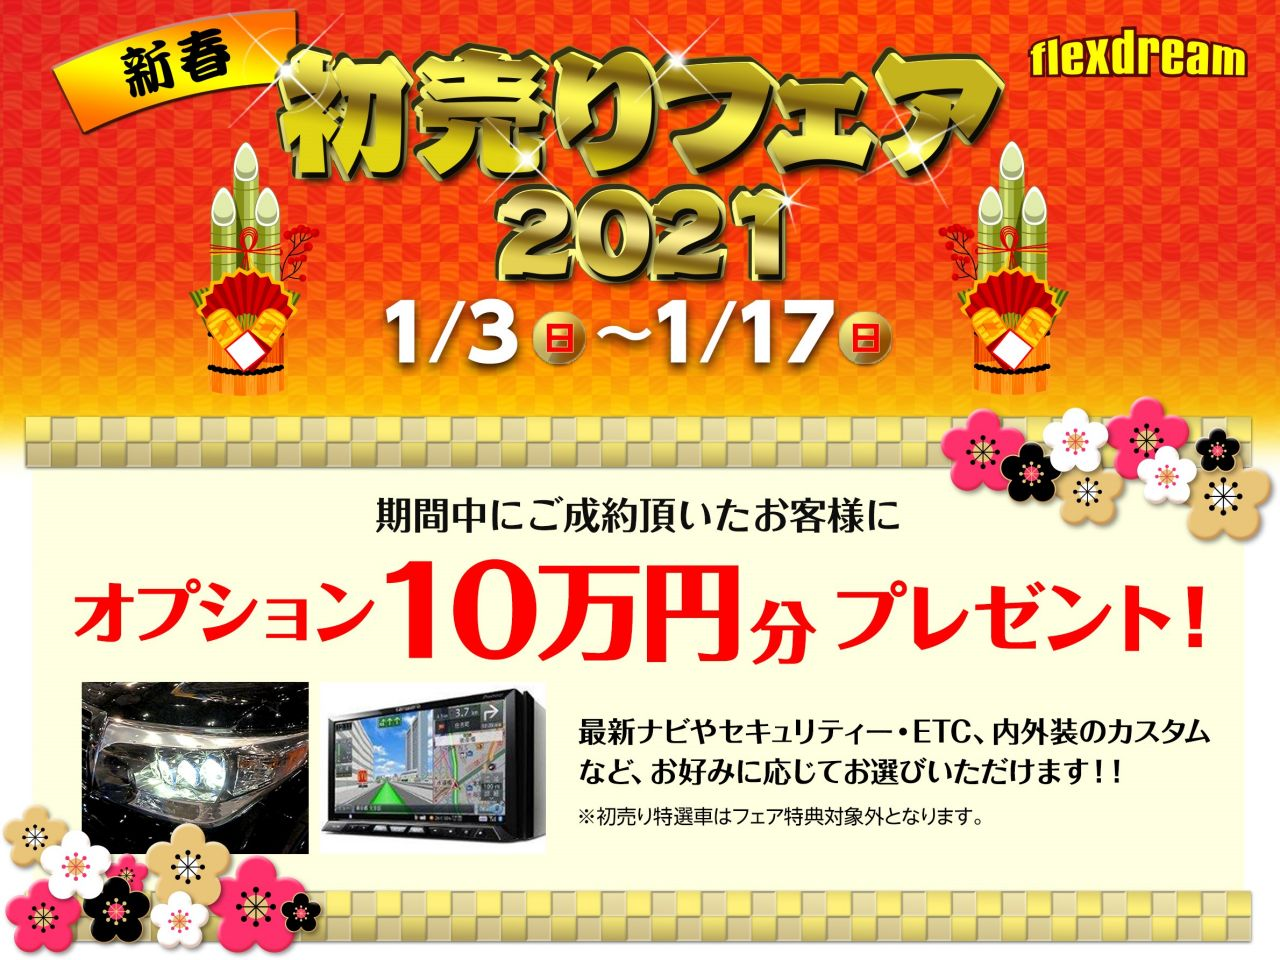 flexdream新春初売りフェア2021-4x3